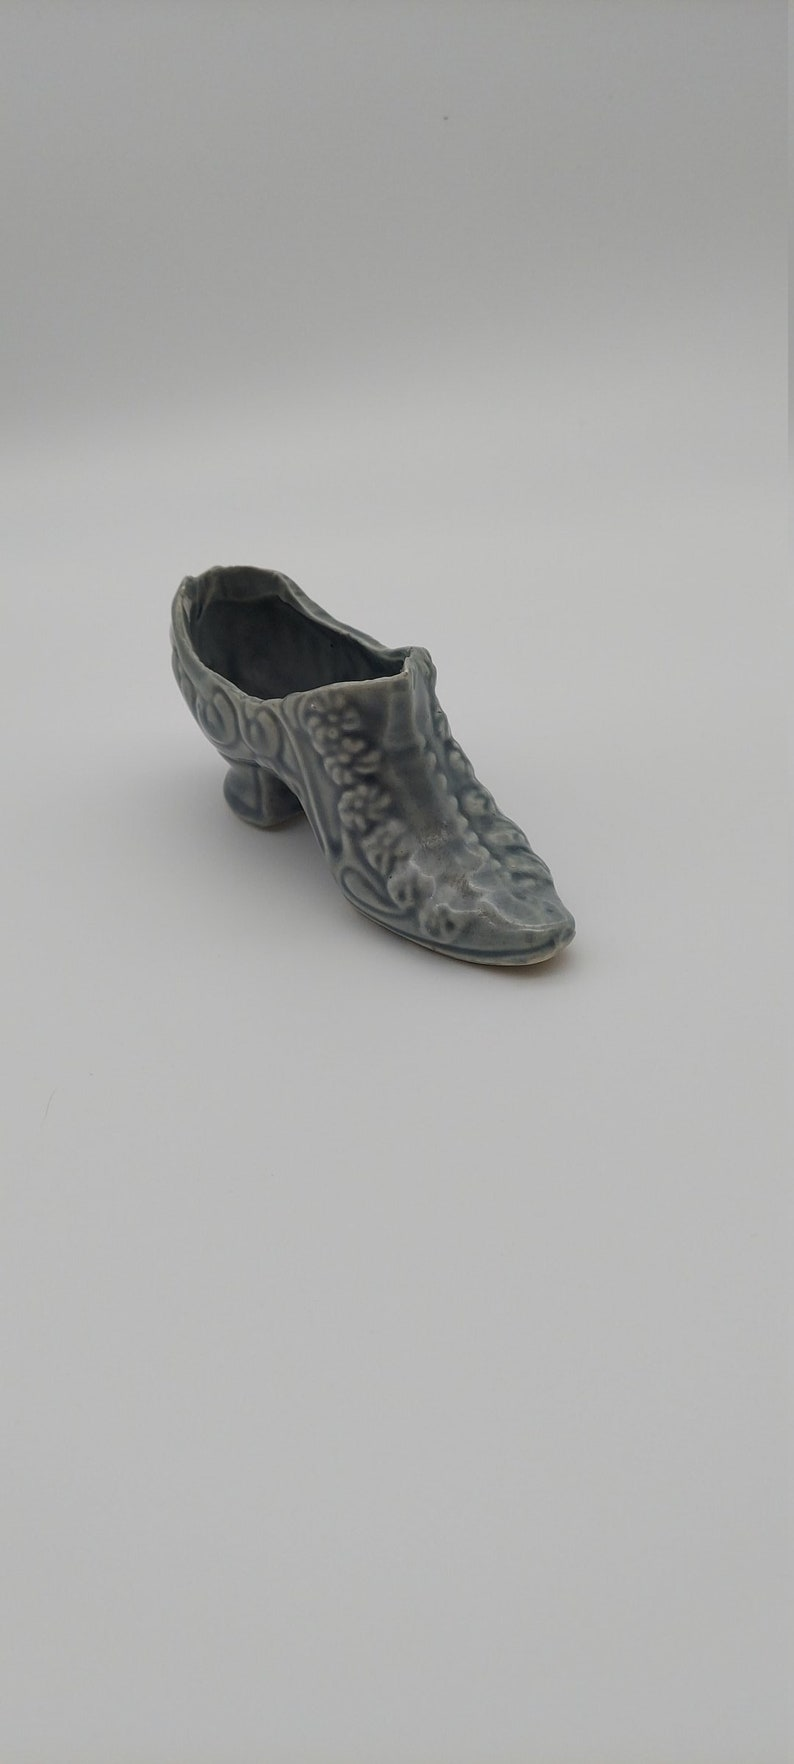 Planter Powder Room Accessory Small Vase Porcelain Shoe Figurine Shoe Collection Vinatge Ceramic Shoe Figurine